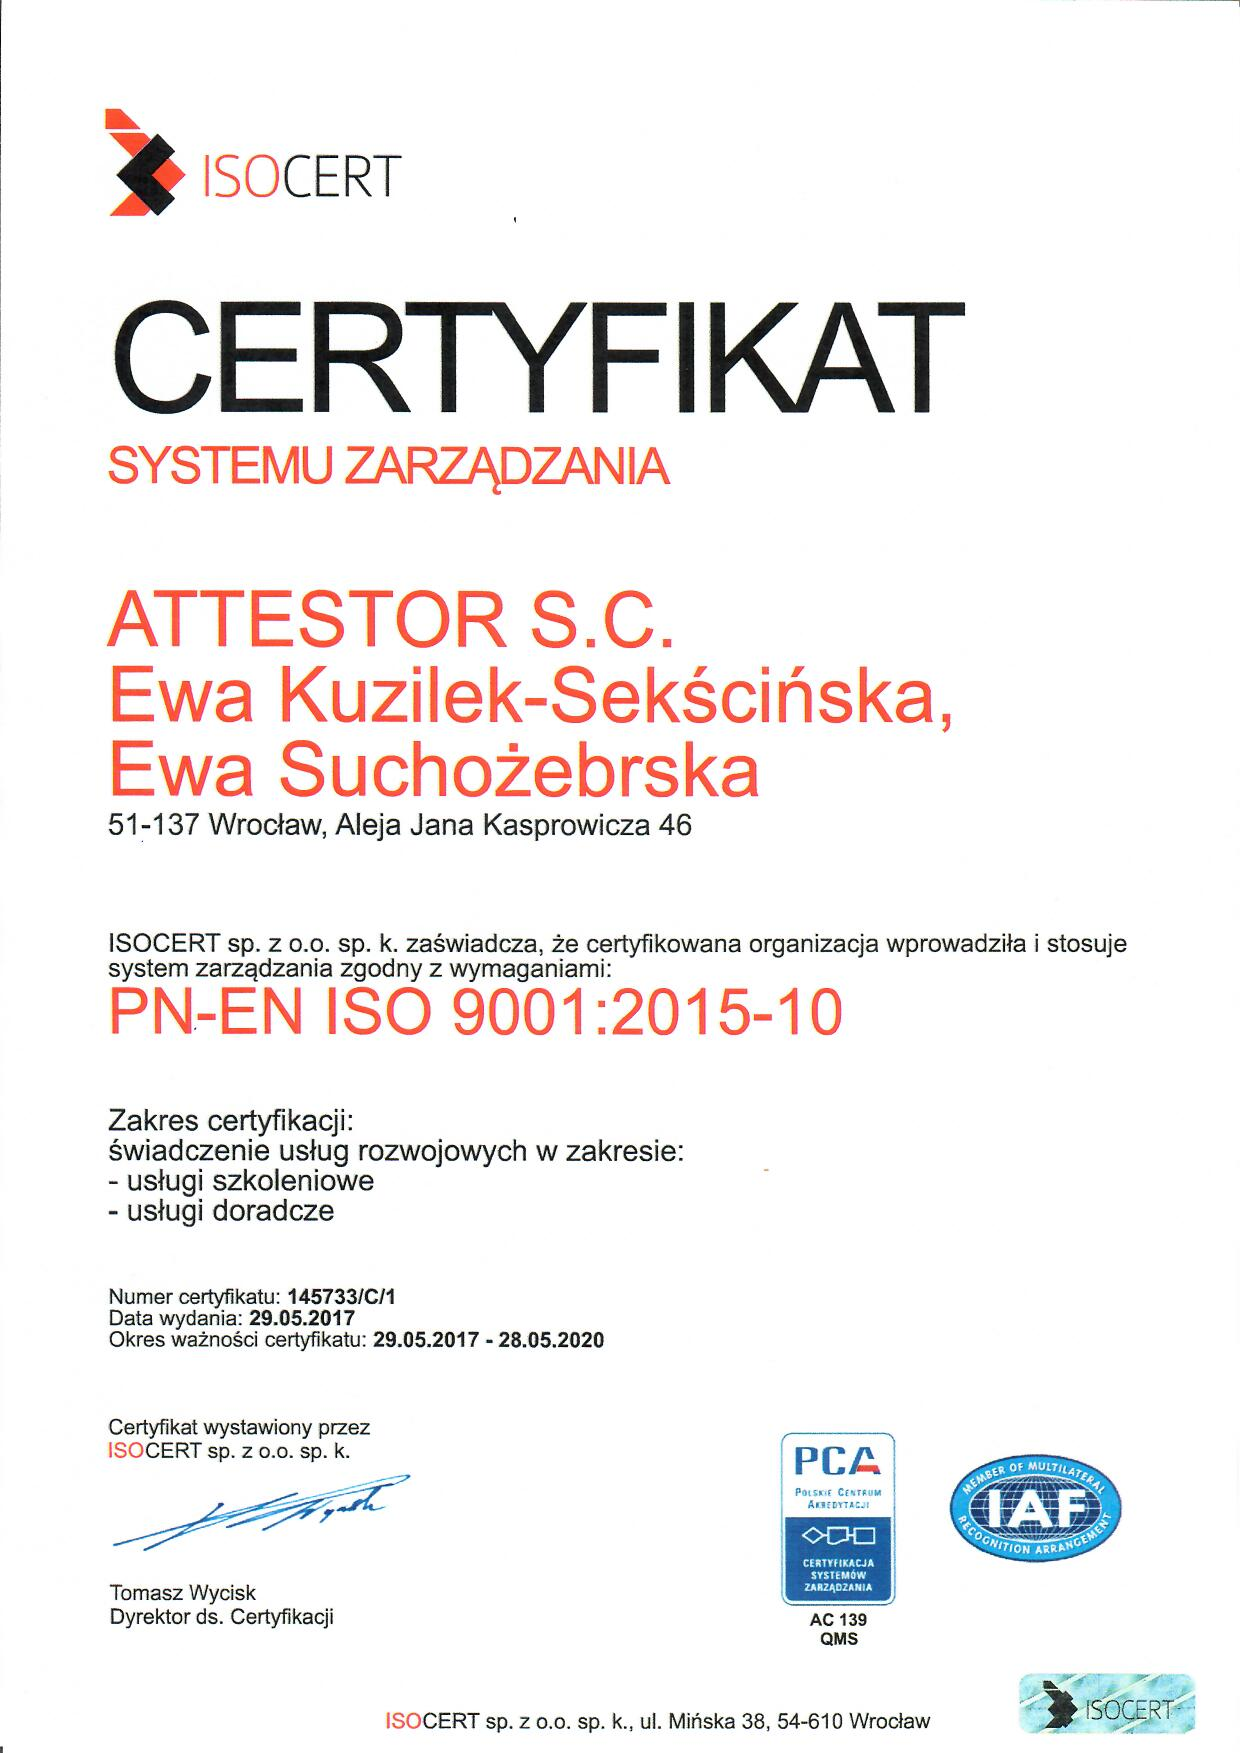 Certyfikat ISO 9001:2015 firmy Attestor SC